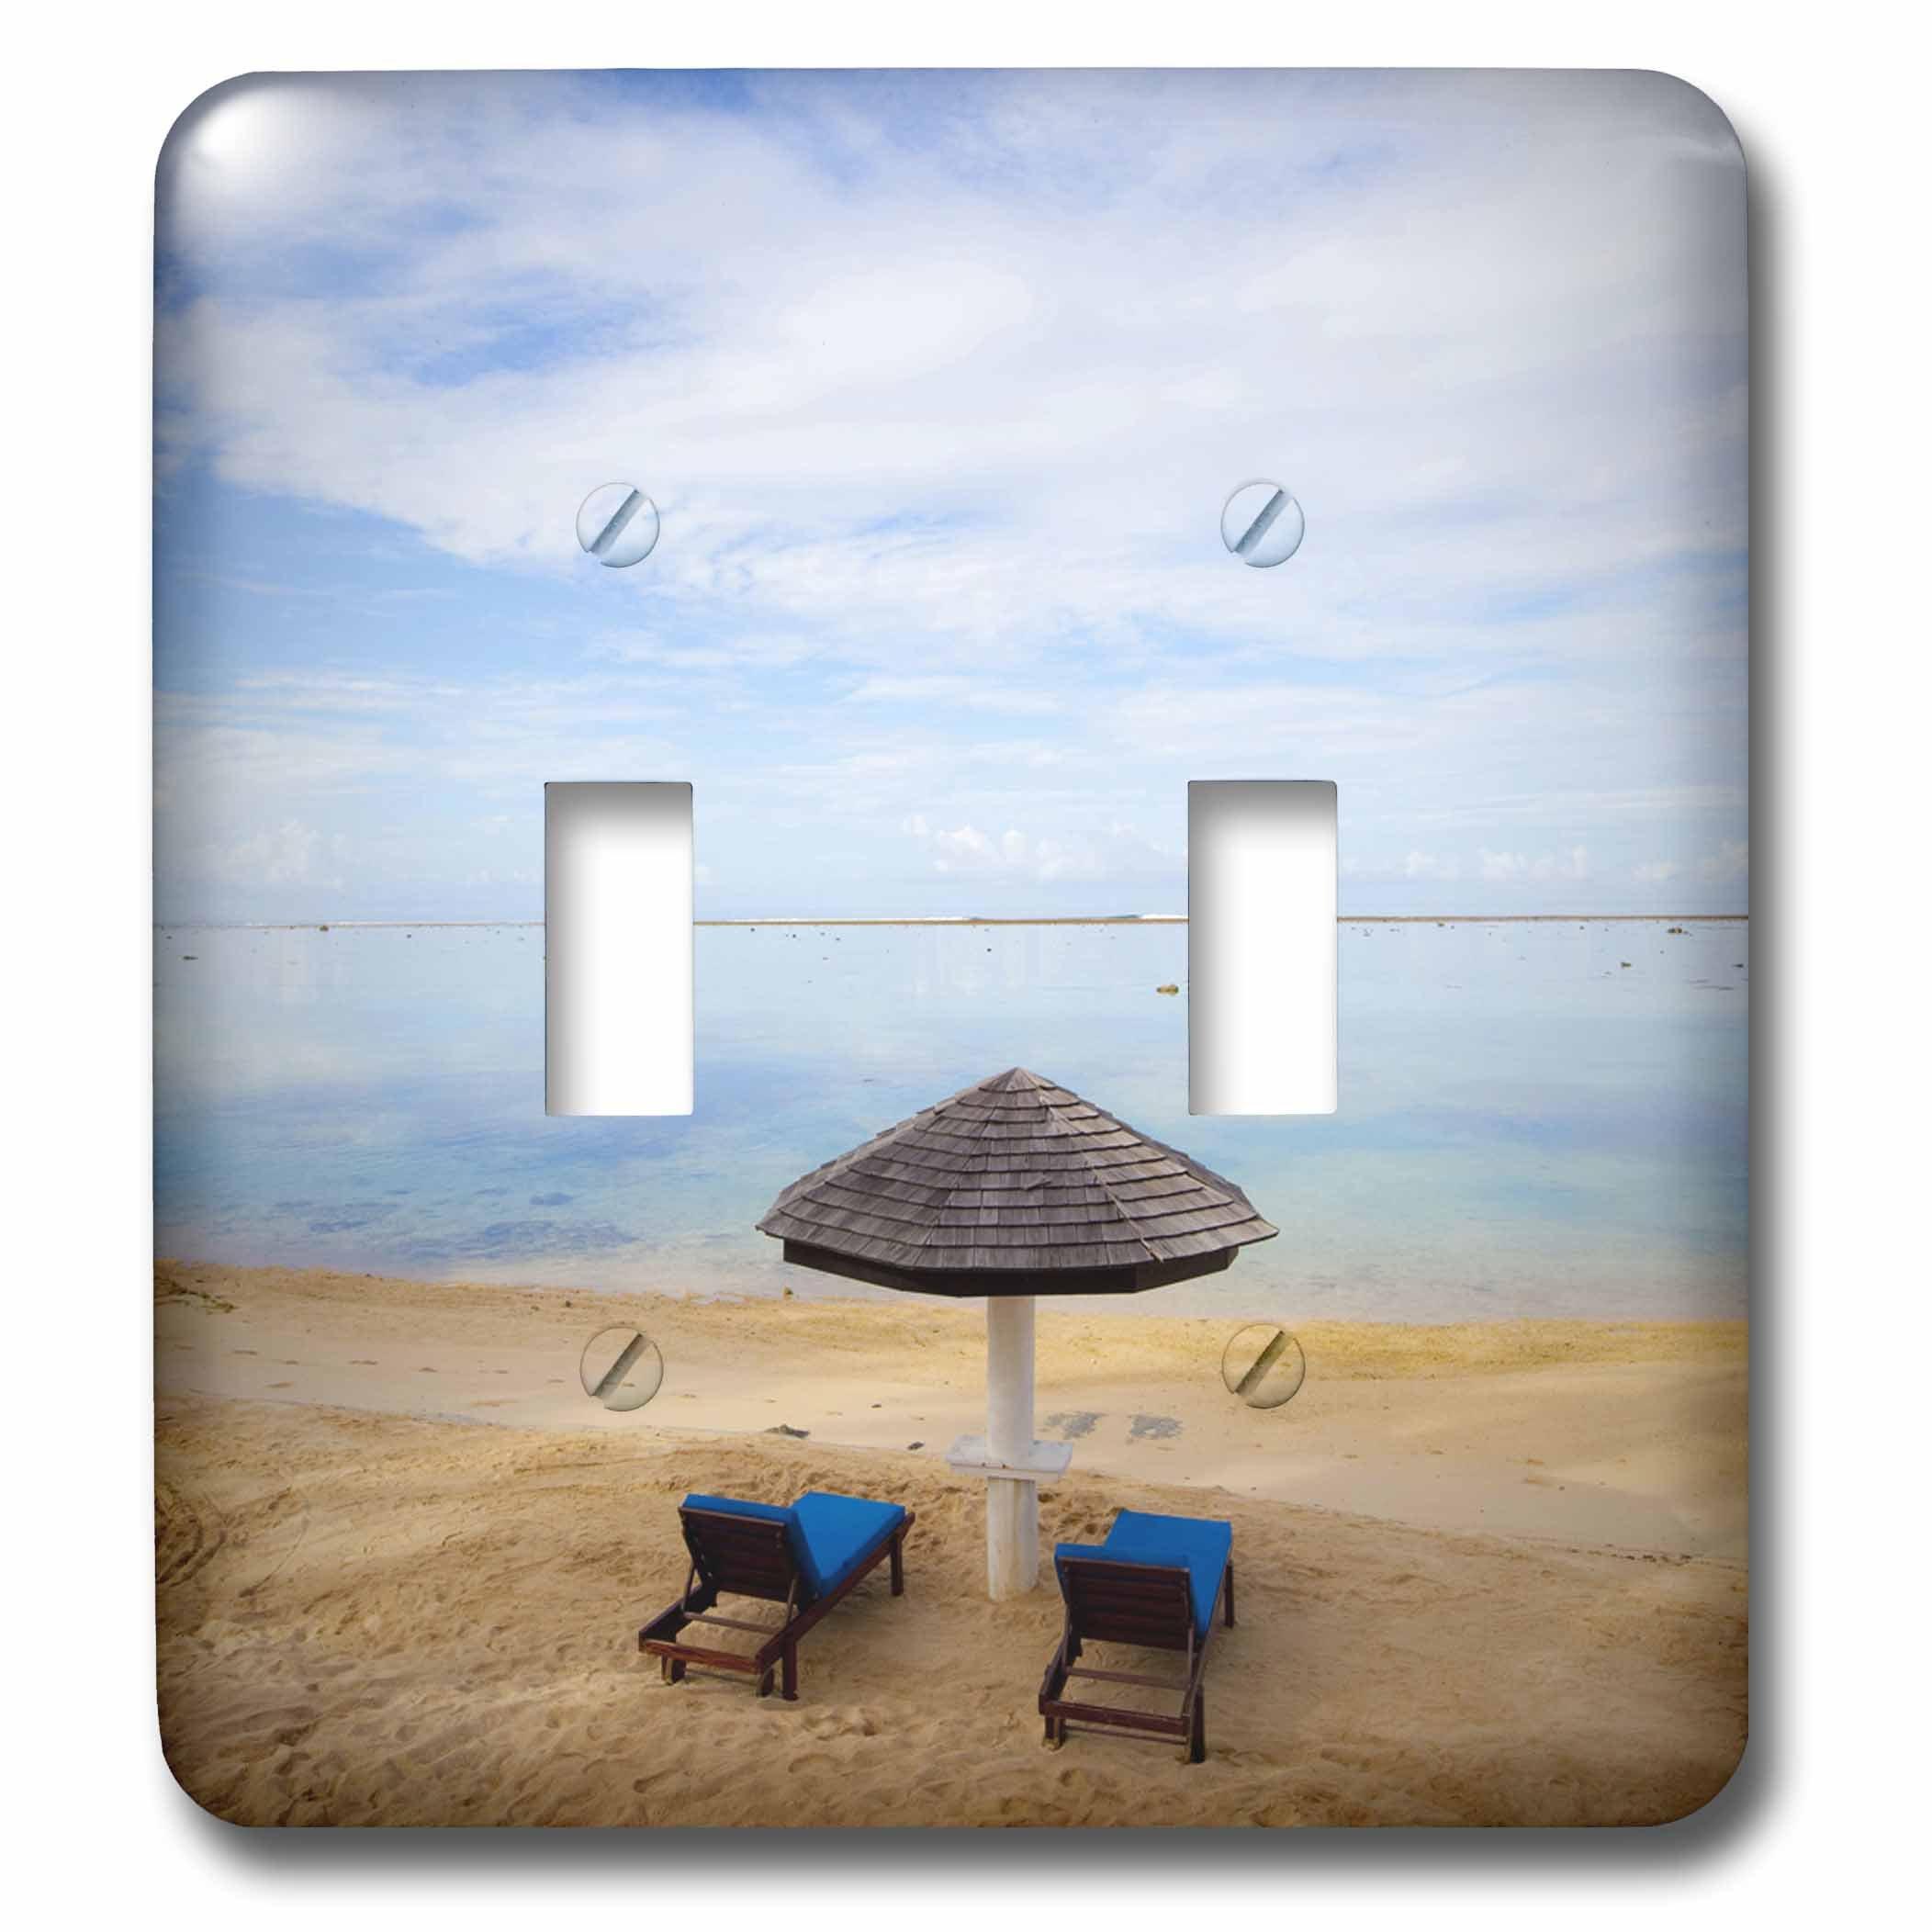 3dRose lsp_84827_2 Warwick Fiji Resort and Spa, Travel, Fiji Oc01 Dpb0248 Douglas Peebles Double Toggle Switch